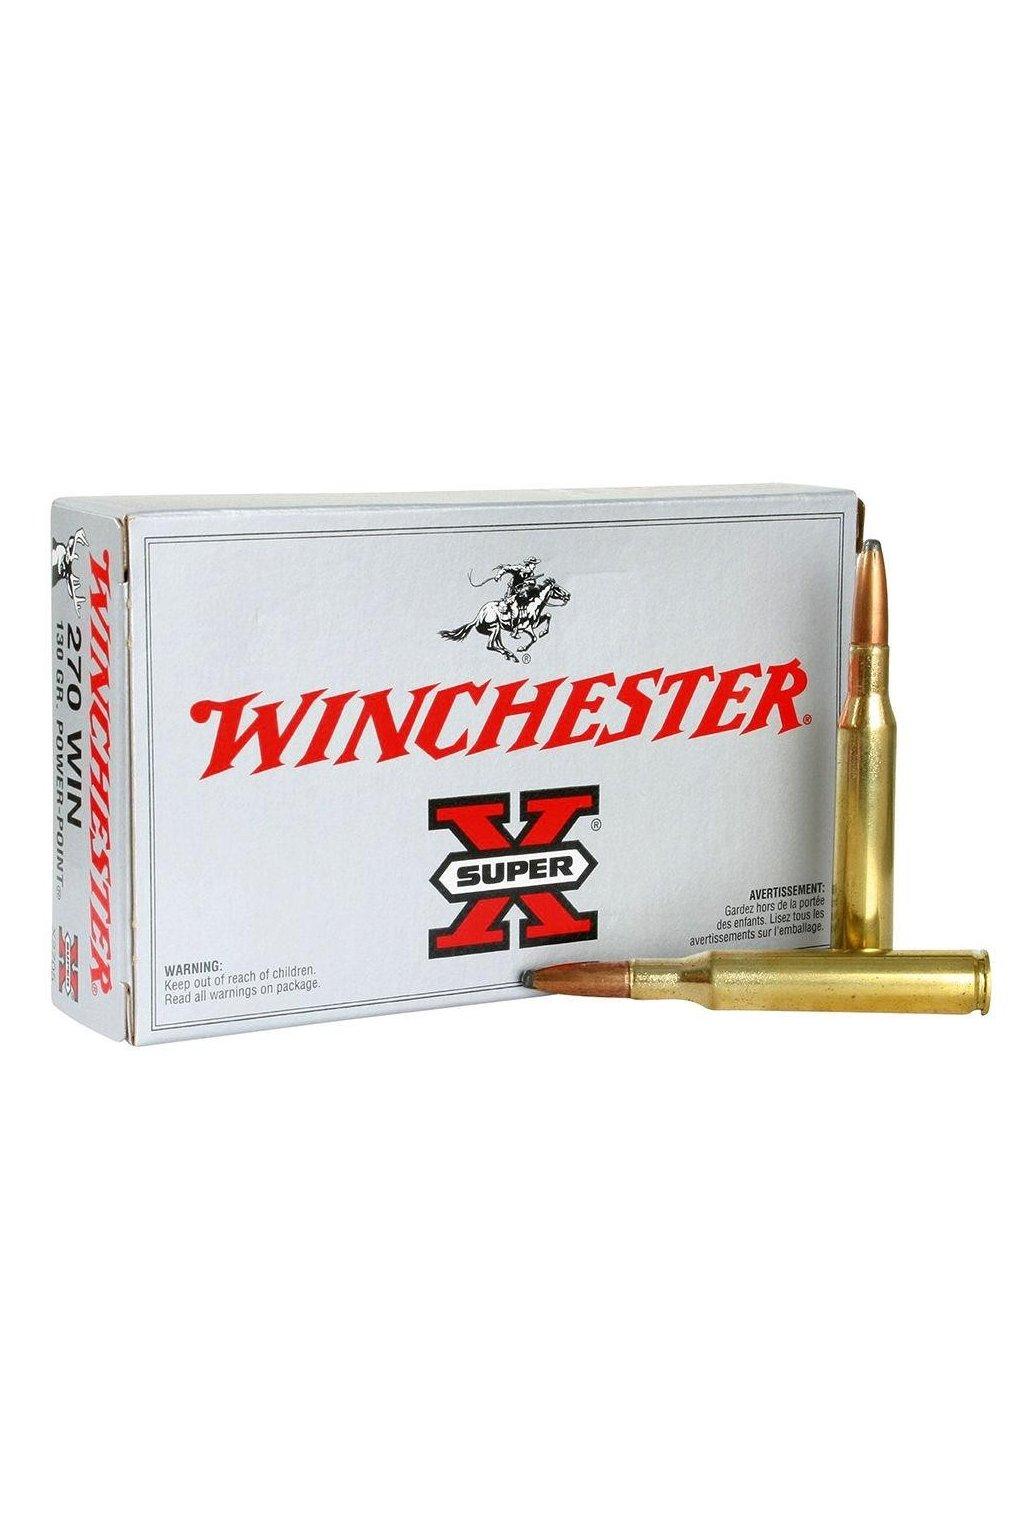 winchester super x 270 win 150grn power point ammunition 20 pack x2704